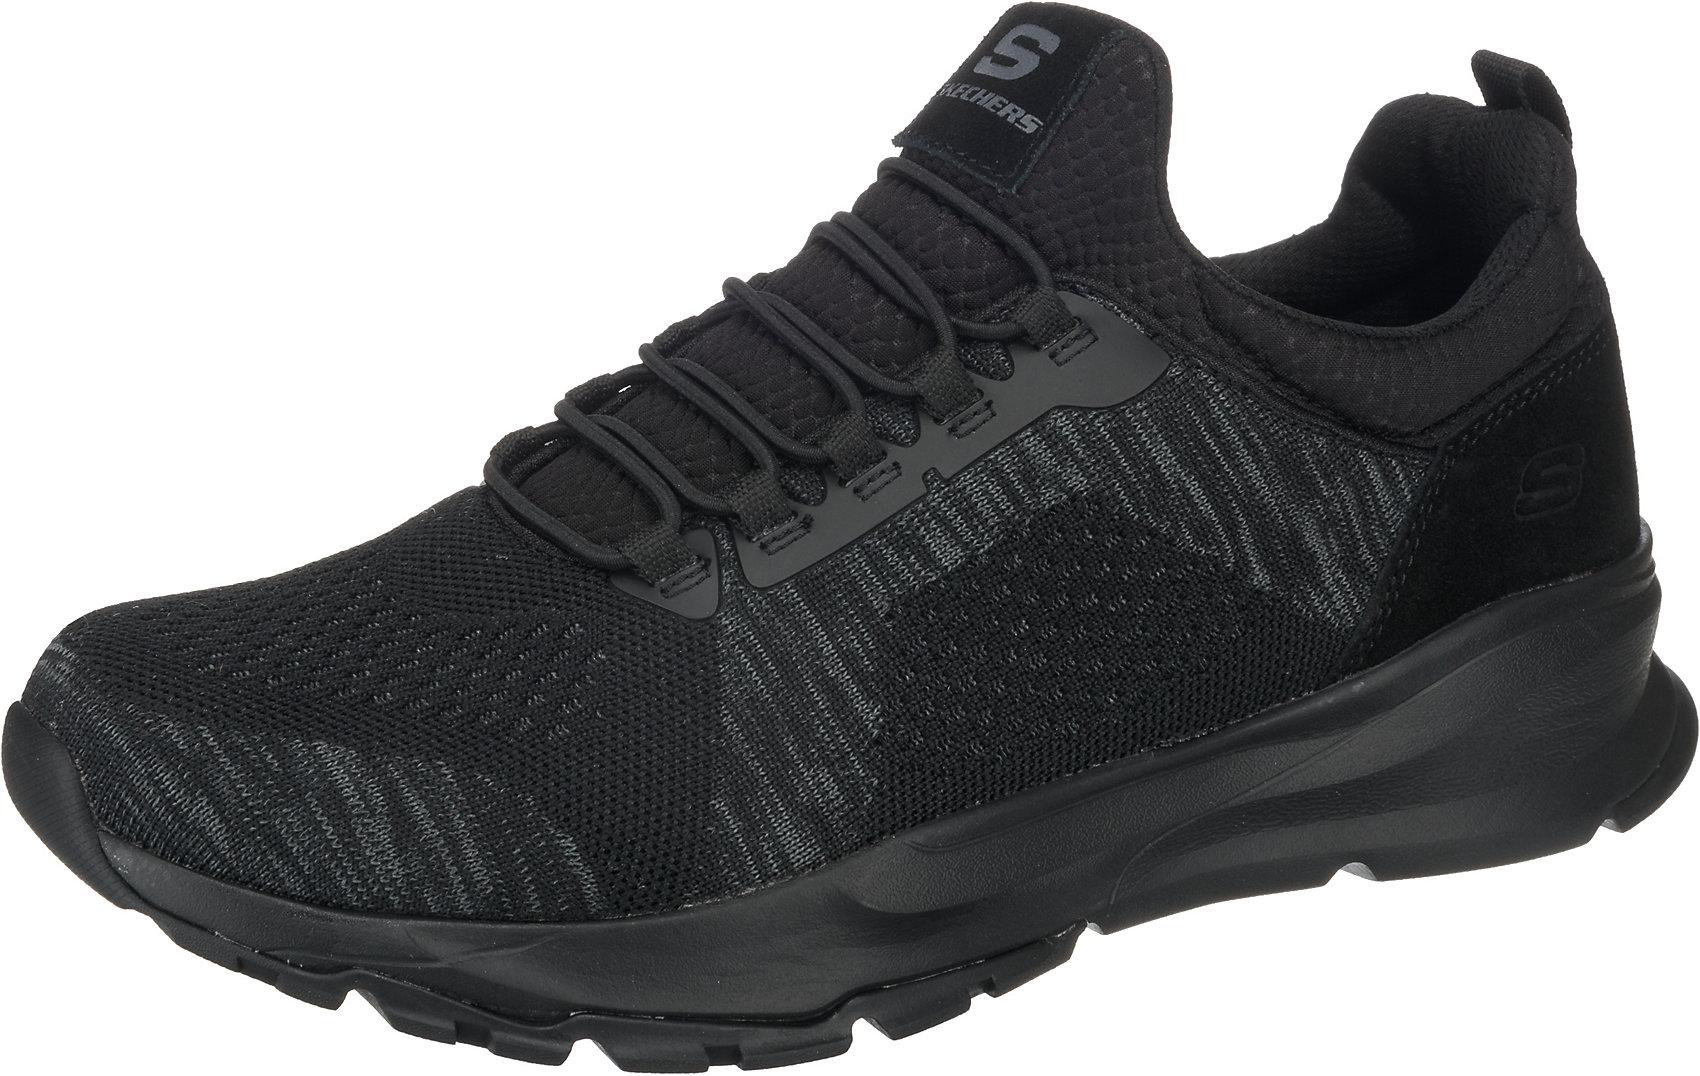 Details zu Neu SKECHERS RELVEN RENTON Sneakers Low 7385092 für Herren schwarzgrau